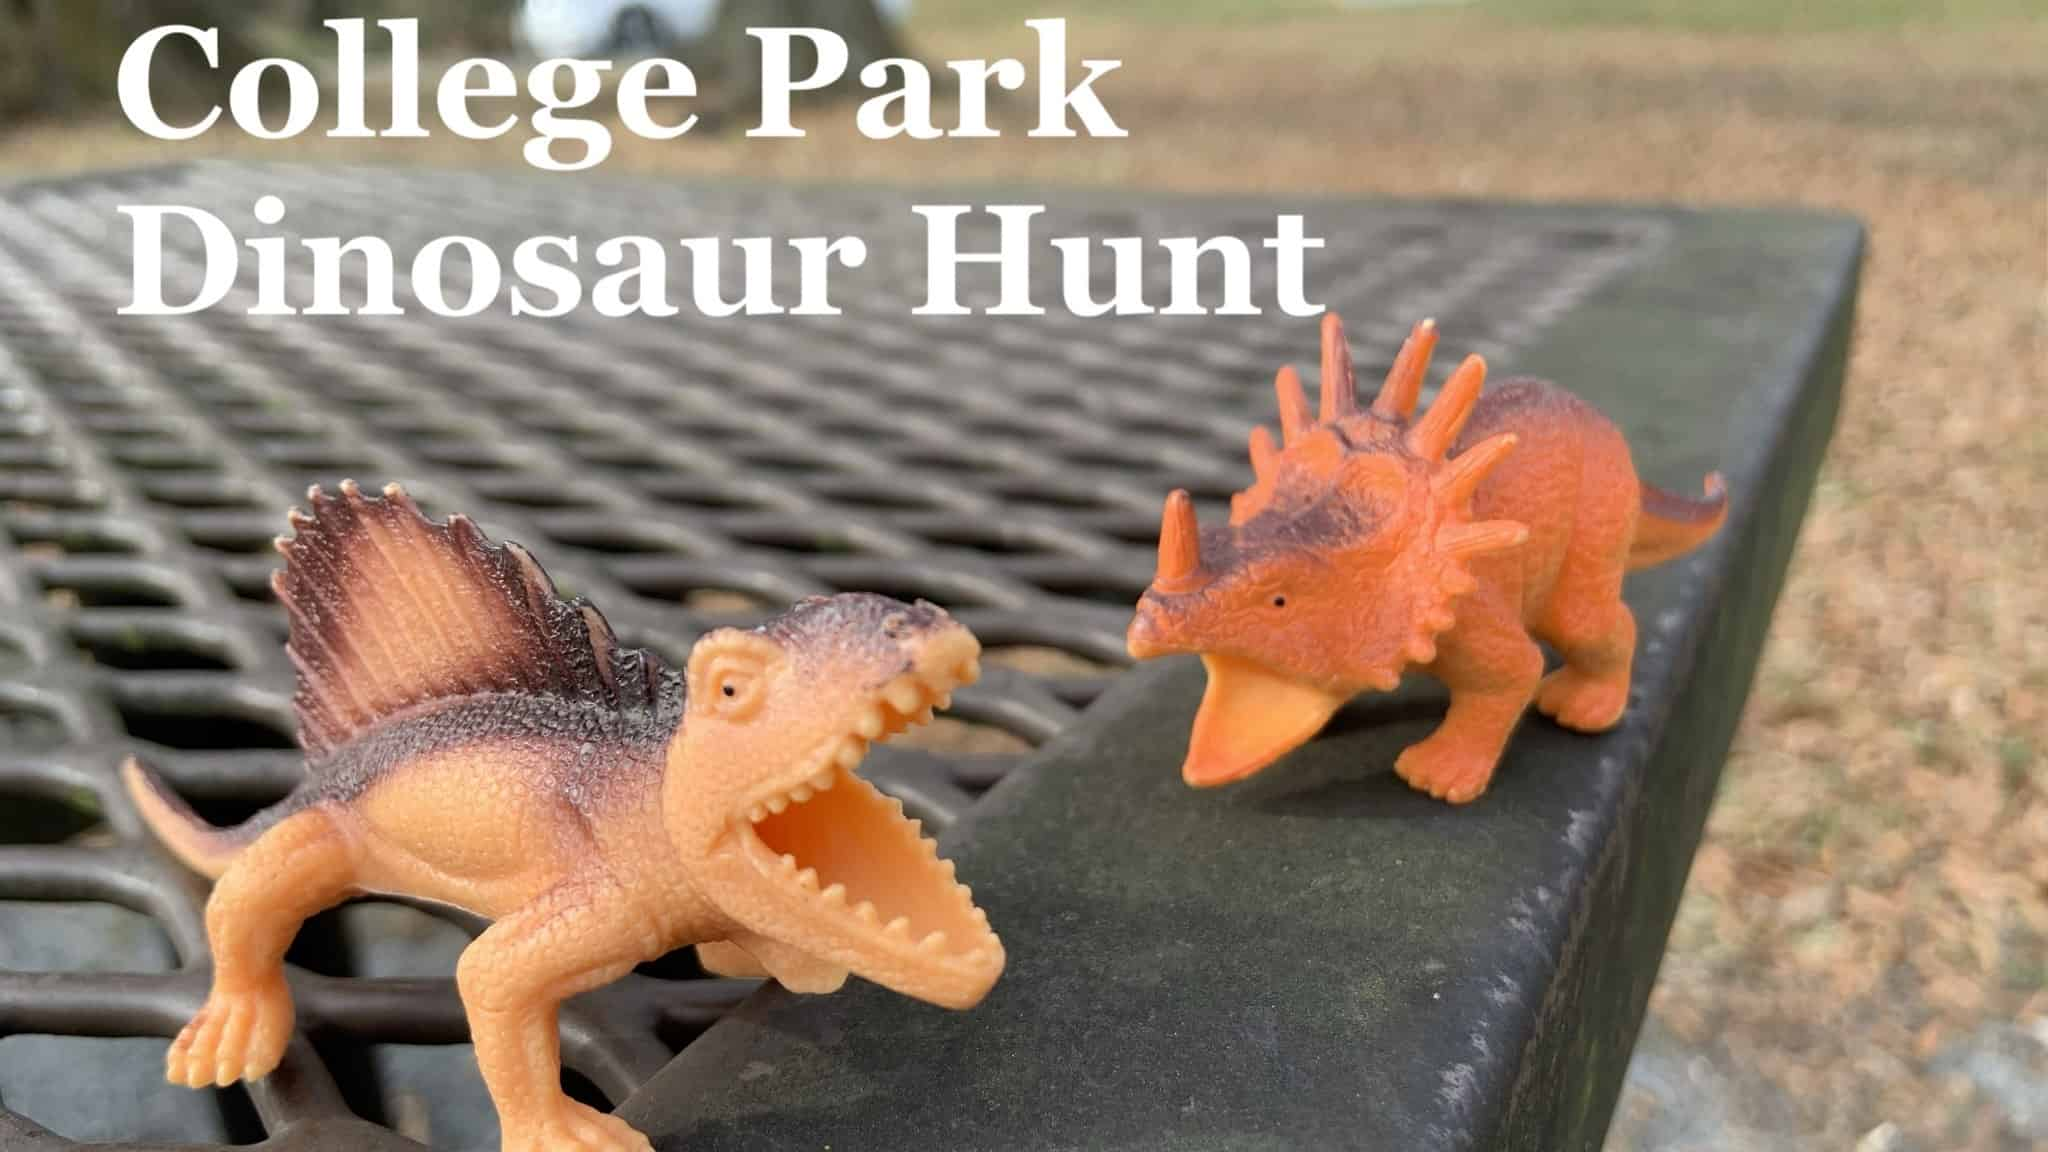 College Park Dinosaur Hunt is this weekend